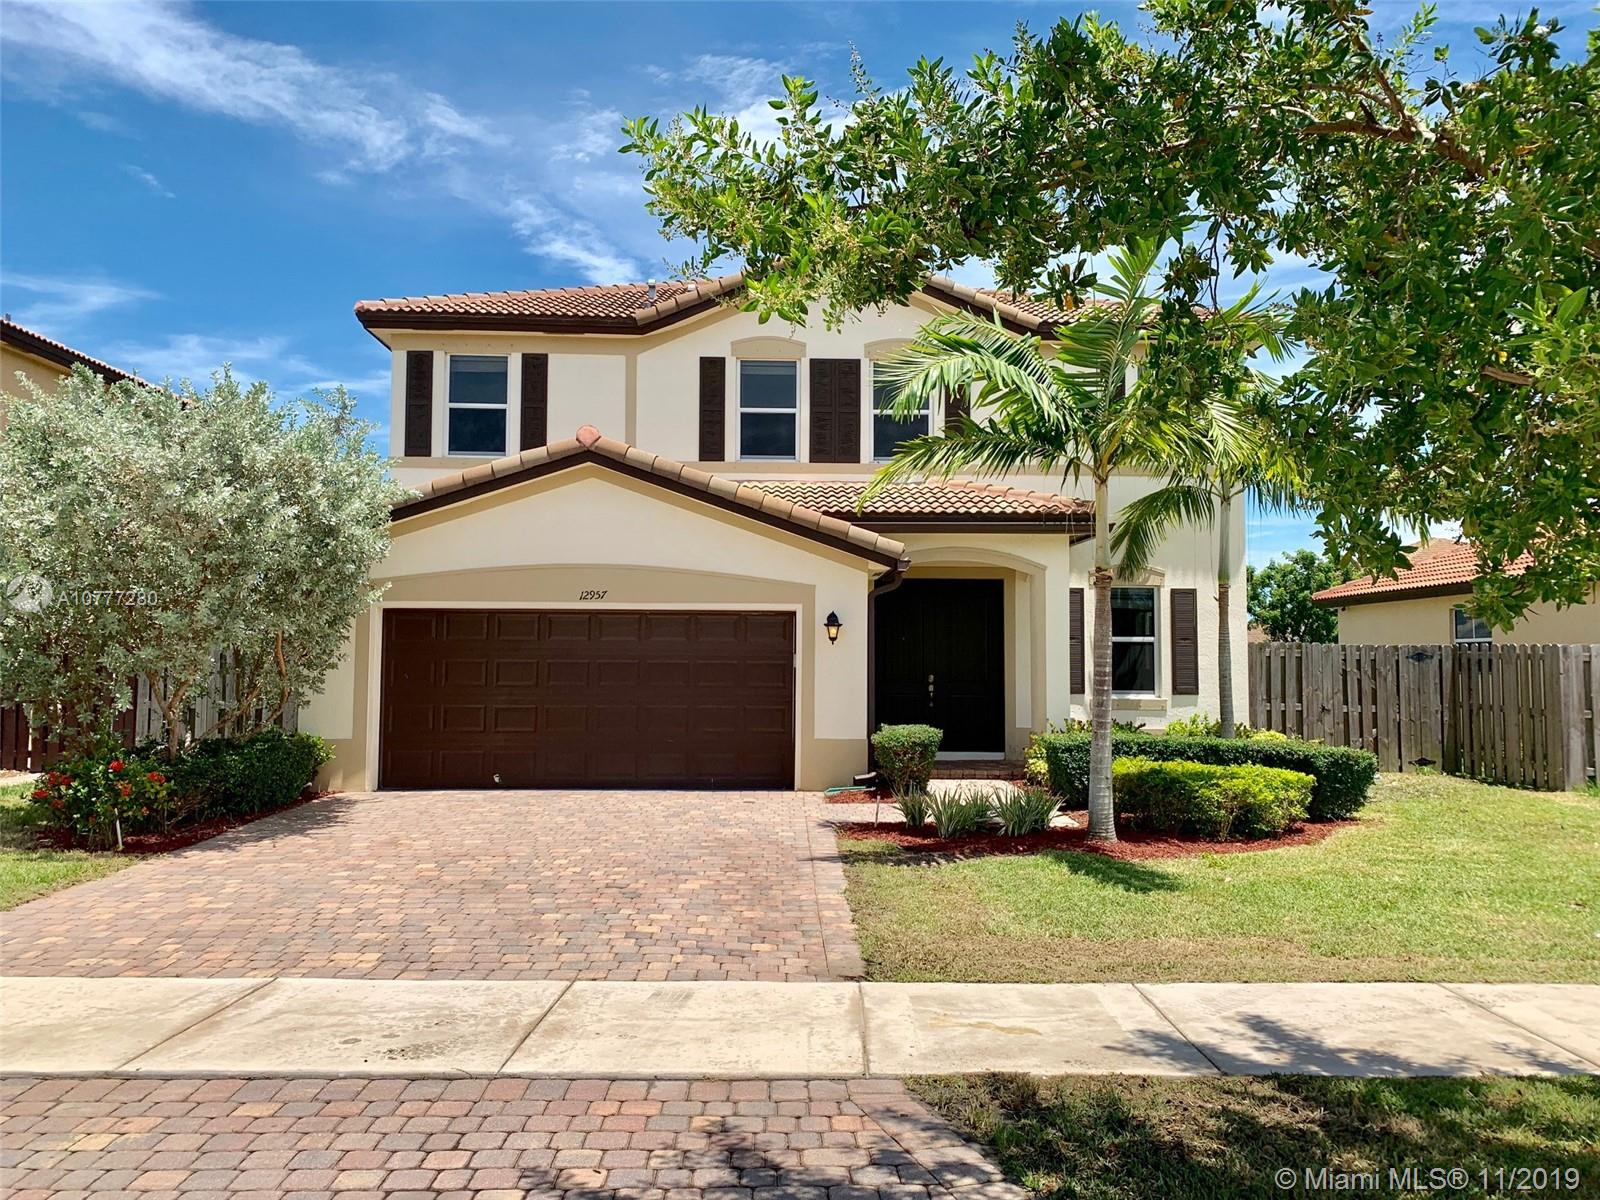 12957 SW 284th St, Homestead, FL 33033 - Homestead, FL real estate listing